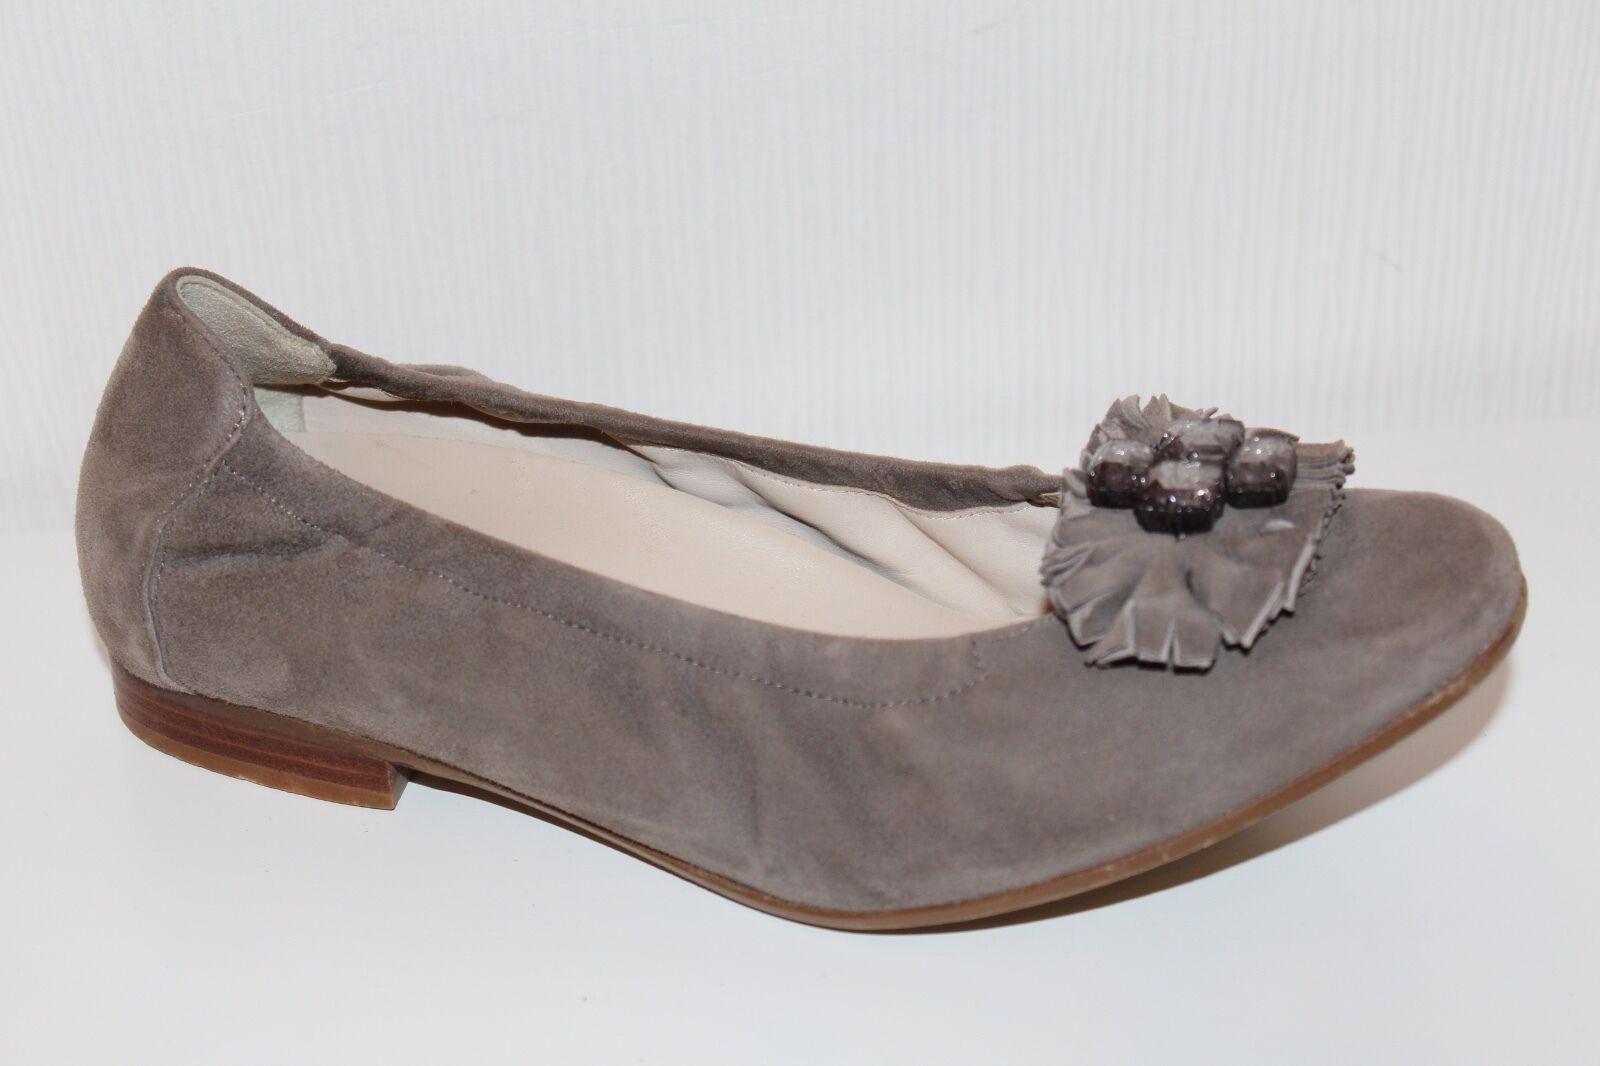 Marc Scarpe donna ballerine 39 uk6 leather flats echt Leder Camoscio ORIGINALI